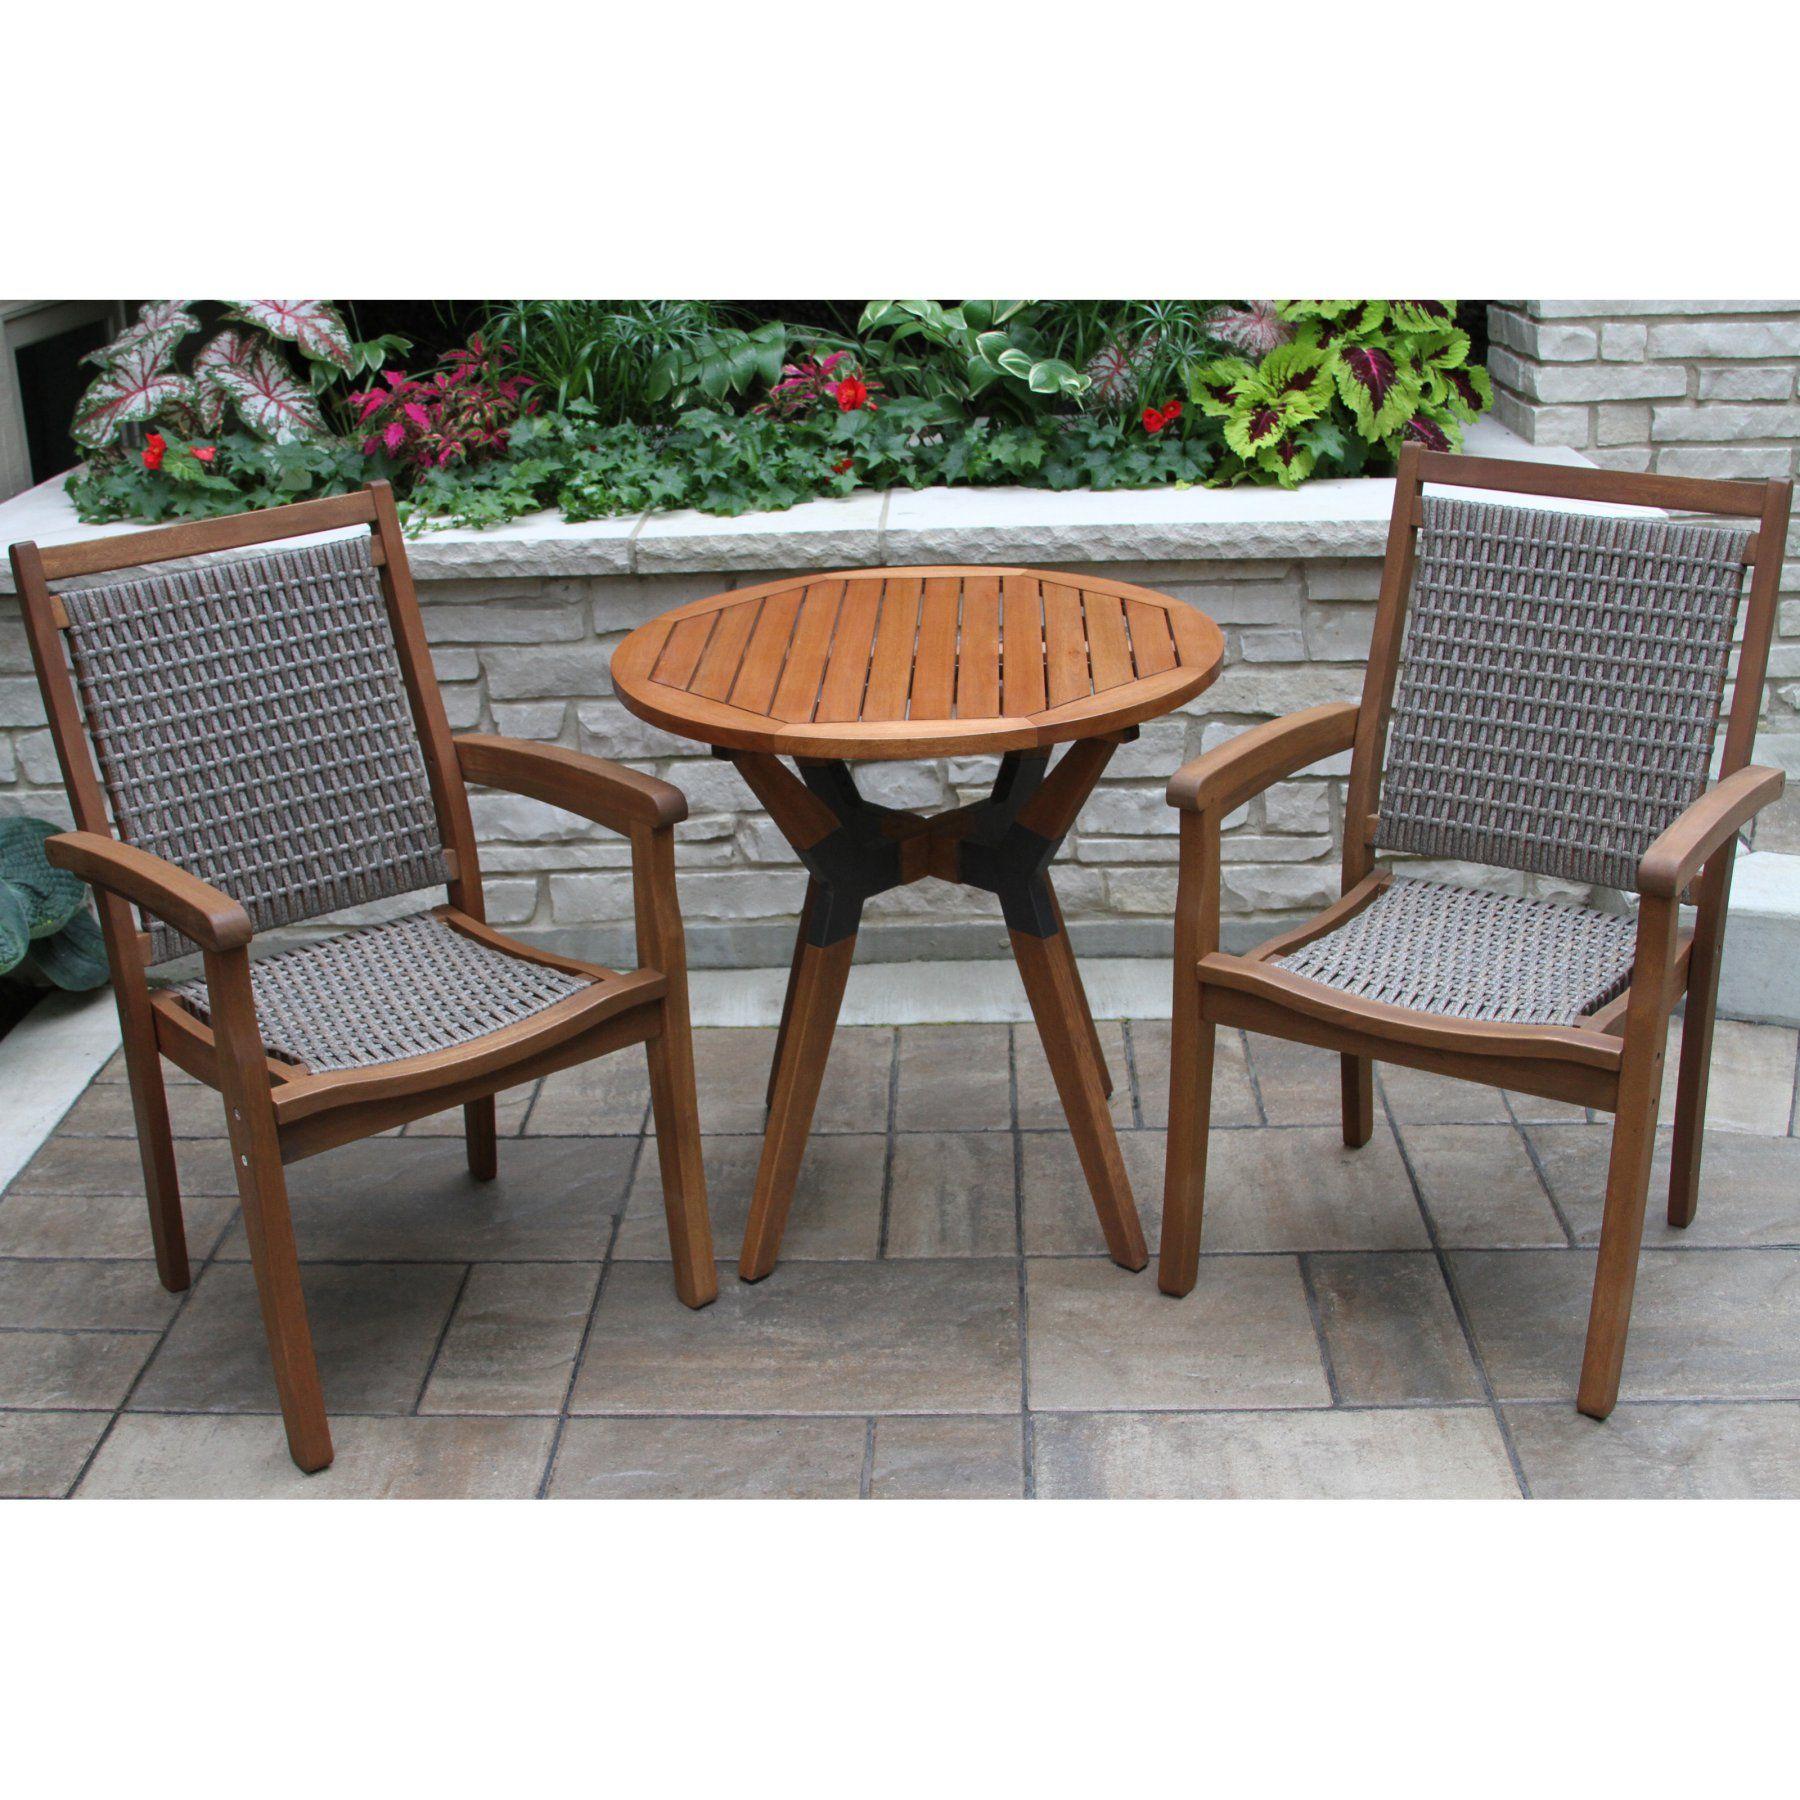 Outdoor interiors round wicker piece outdoor bistro set outr